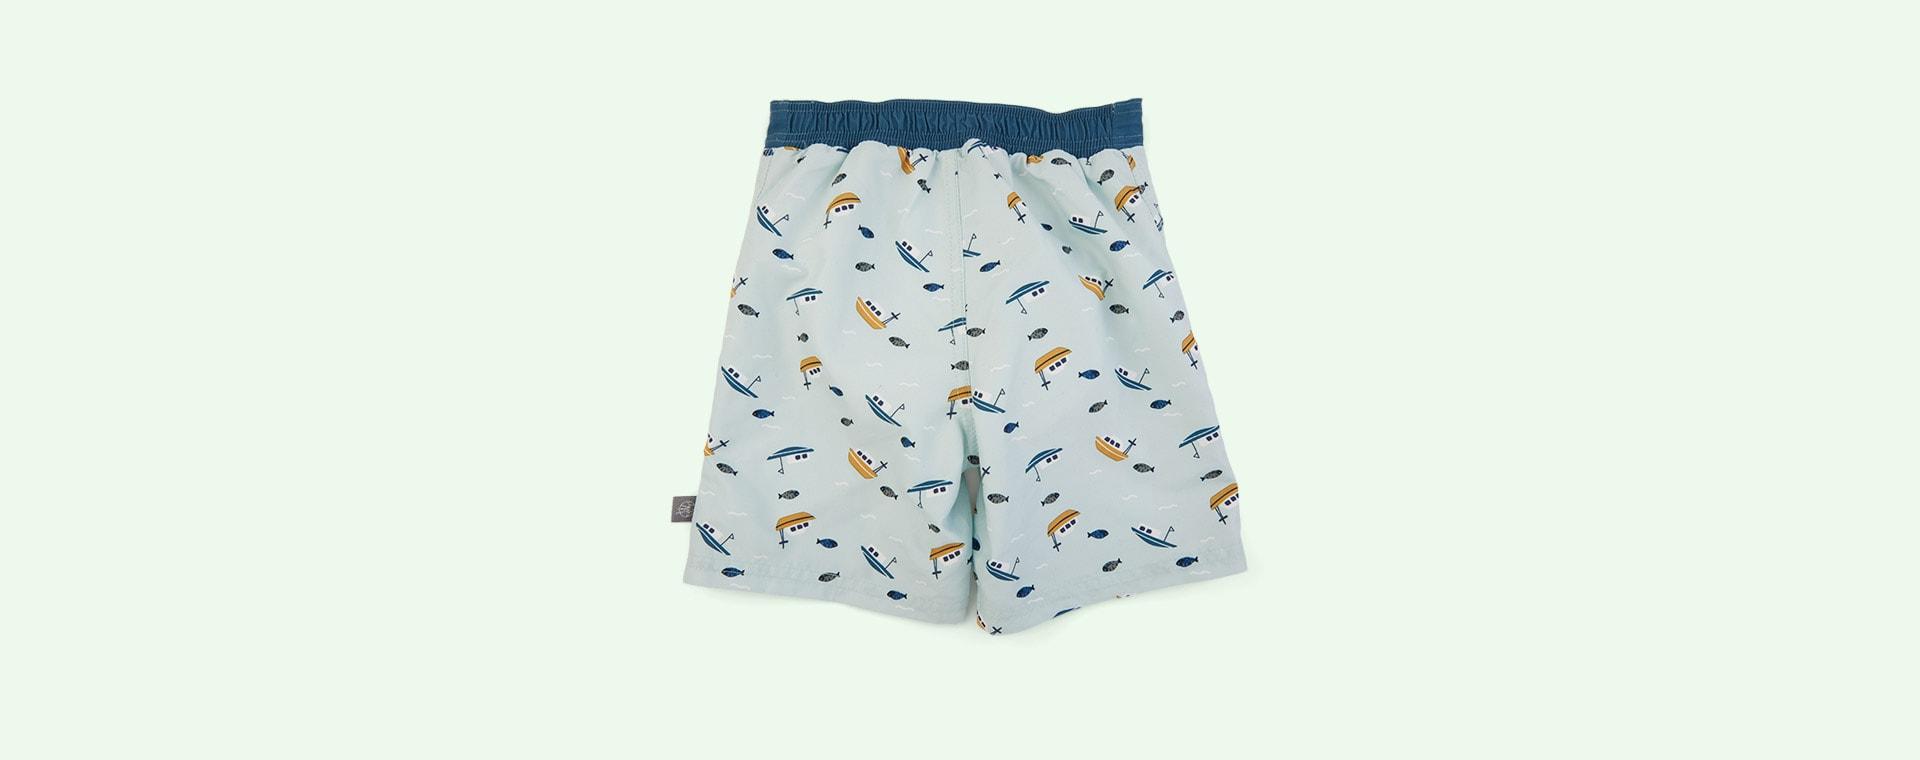 Boat Mint Lassig Board Shorts